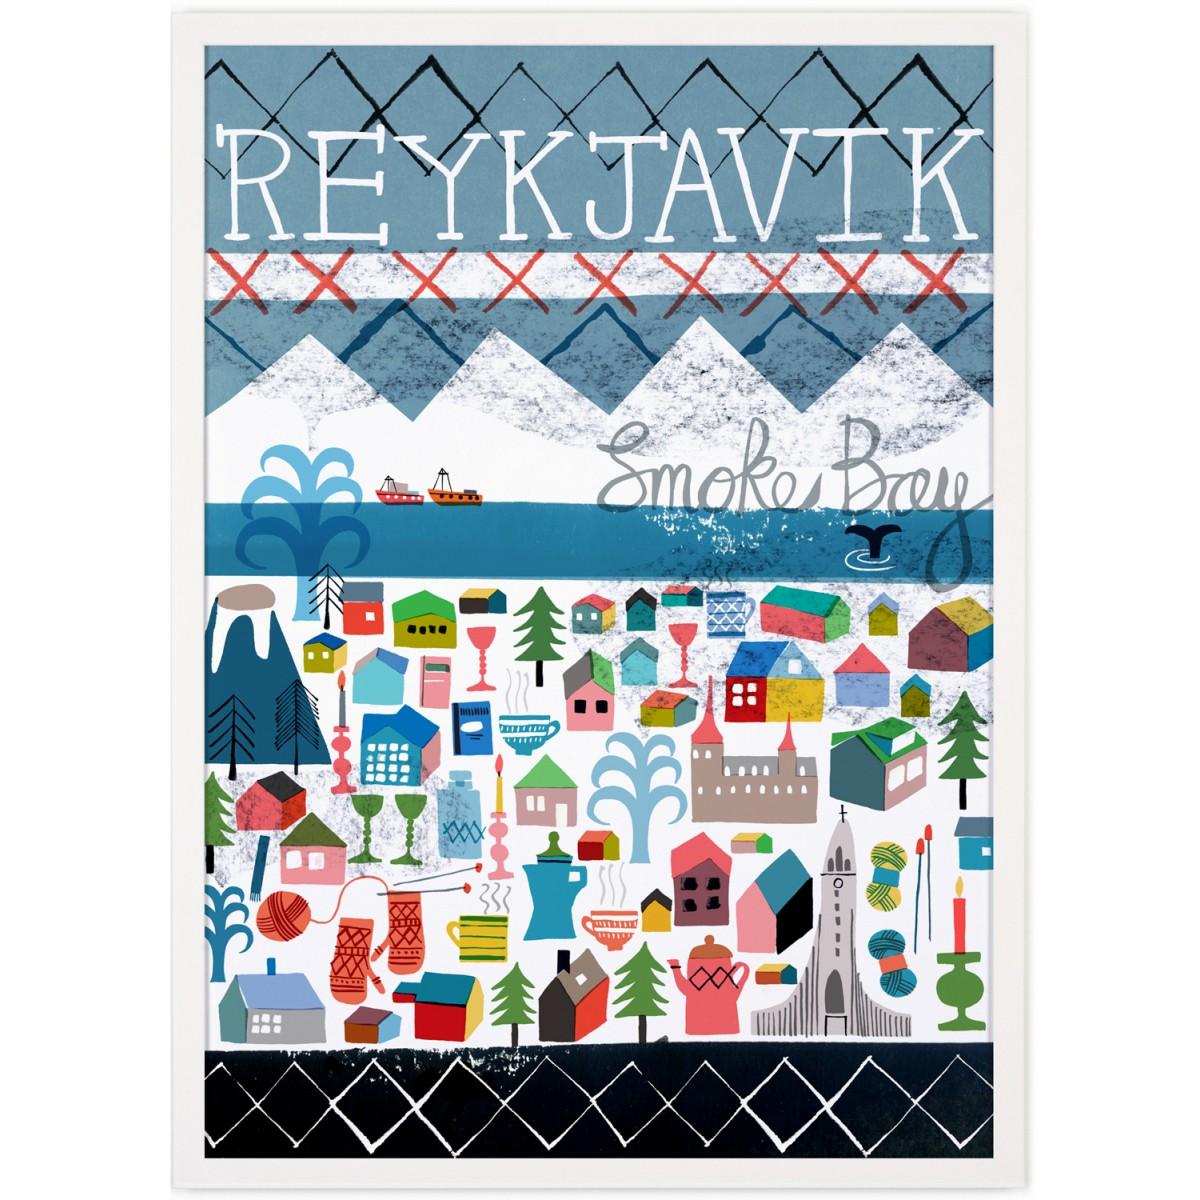 Human Empire Reykjavik Poster (50x70cm)